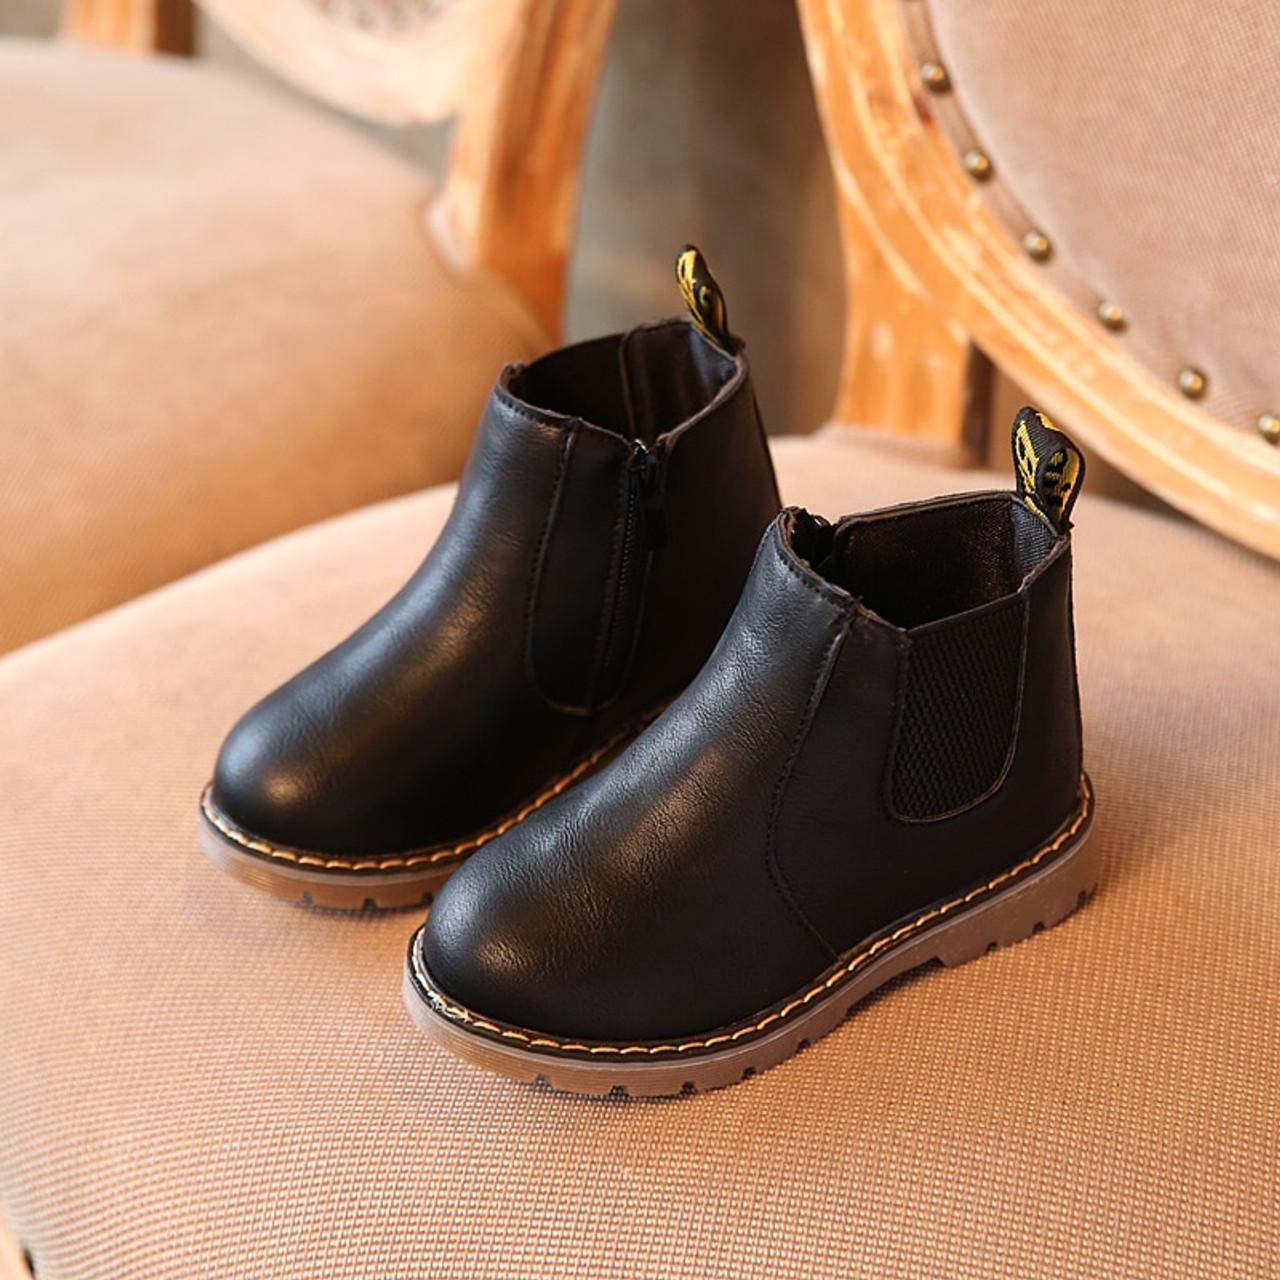 Hot SALE Kids Shoes Girls Boots Autumn